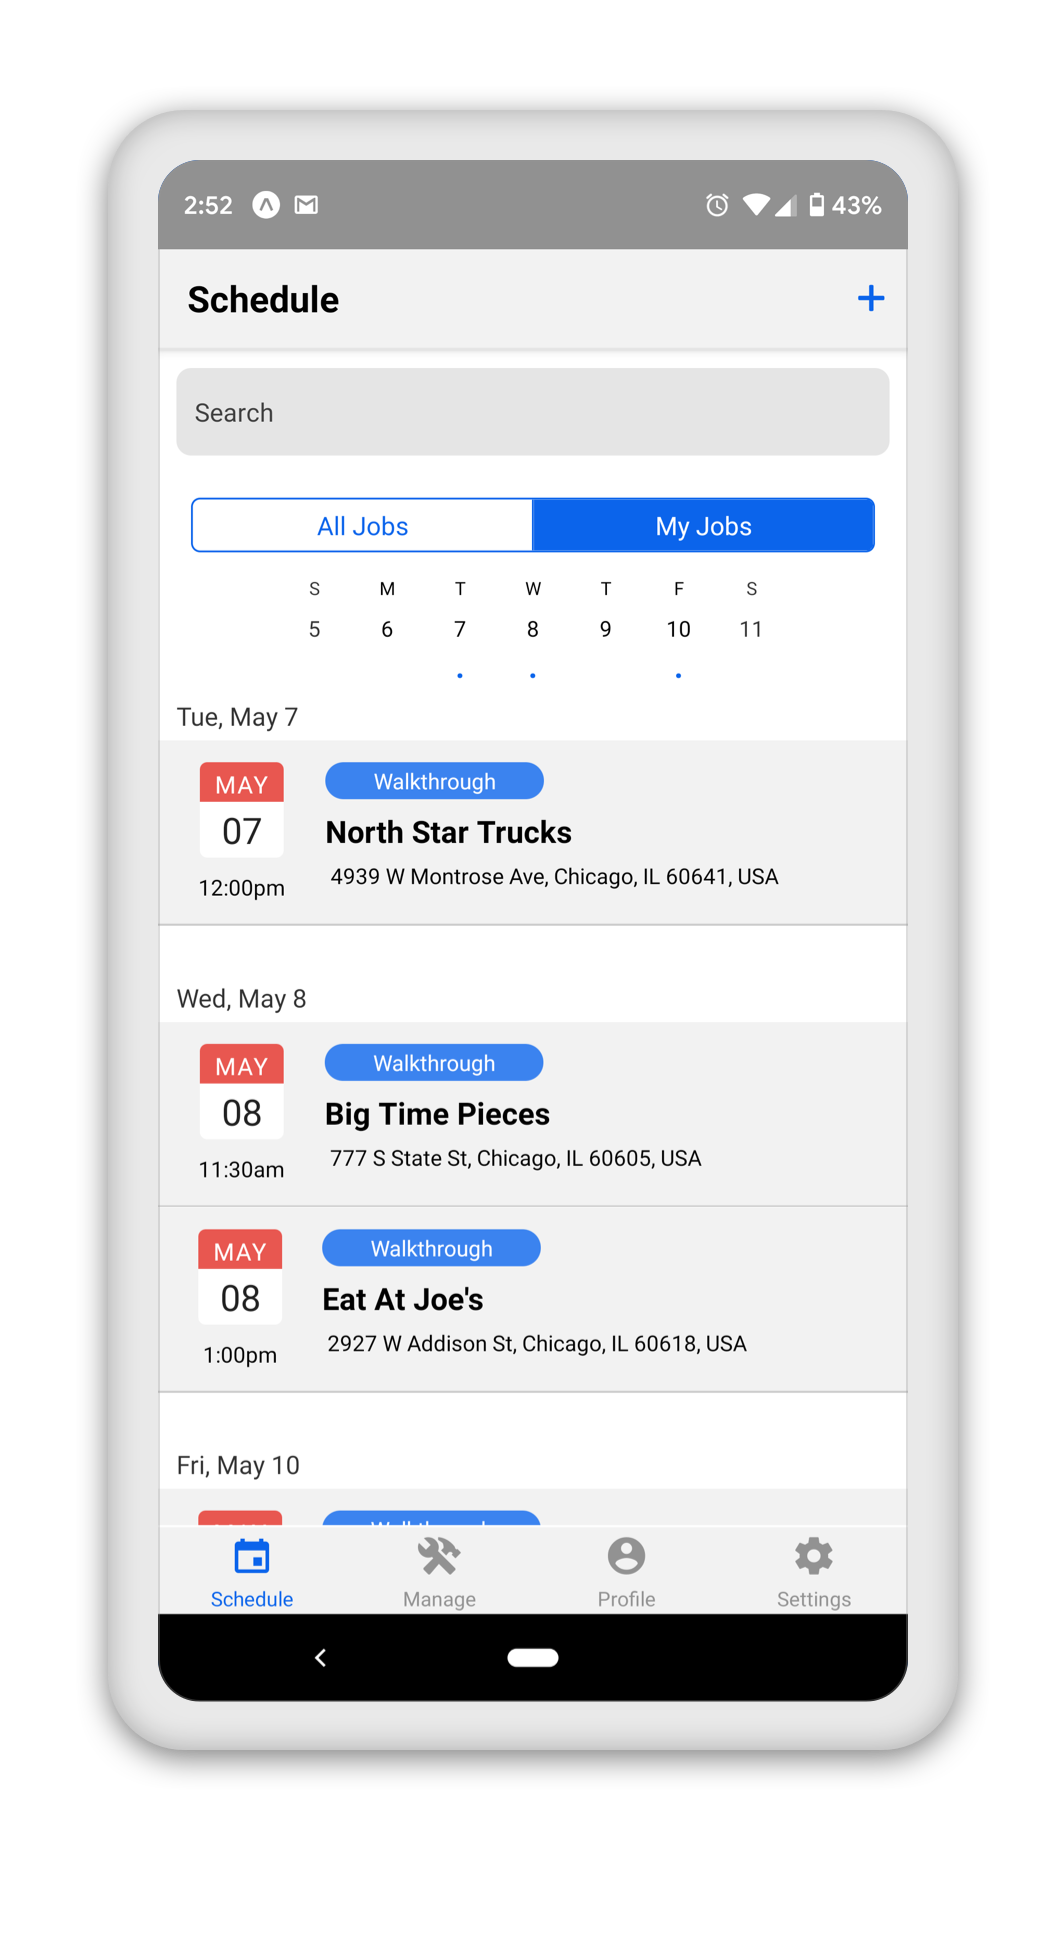 screen showing a schedule of walkthroughs